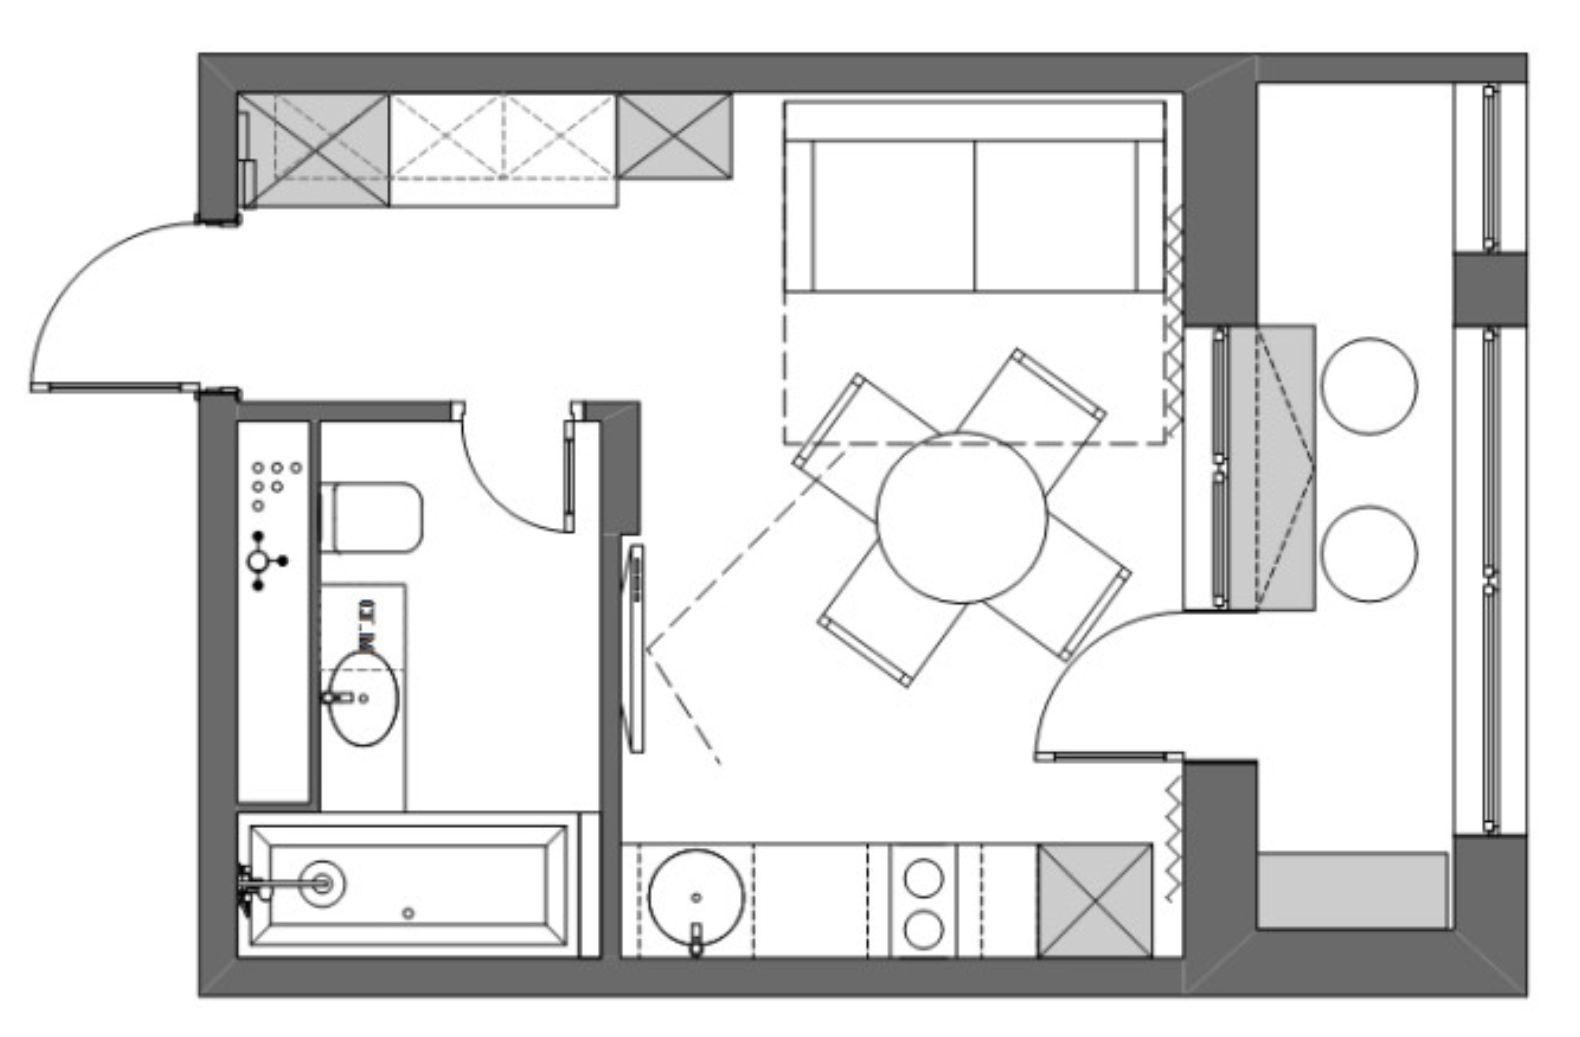 Planul garsonierei este unul clasic, suprafața totală fiind de 22 metri pătrați.